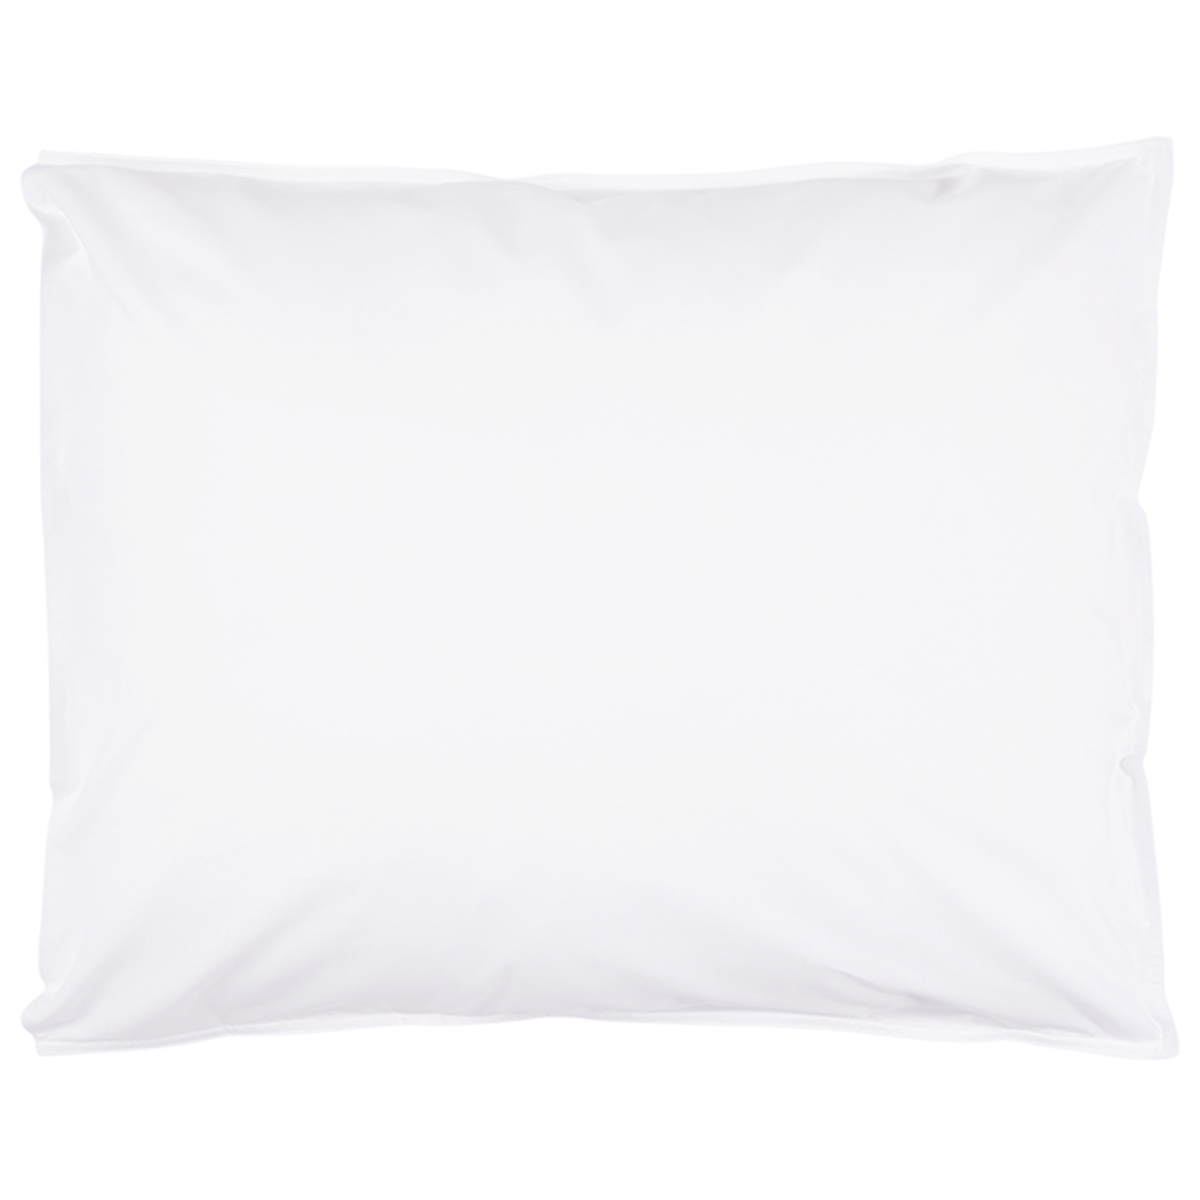 Matri Noora Pillowcase, White